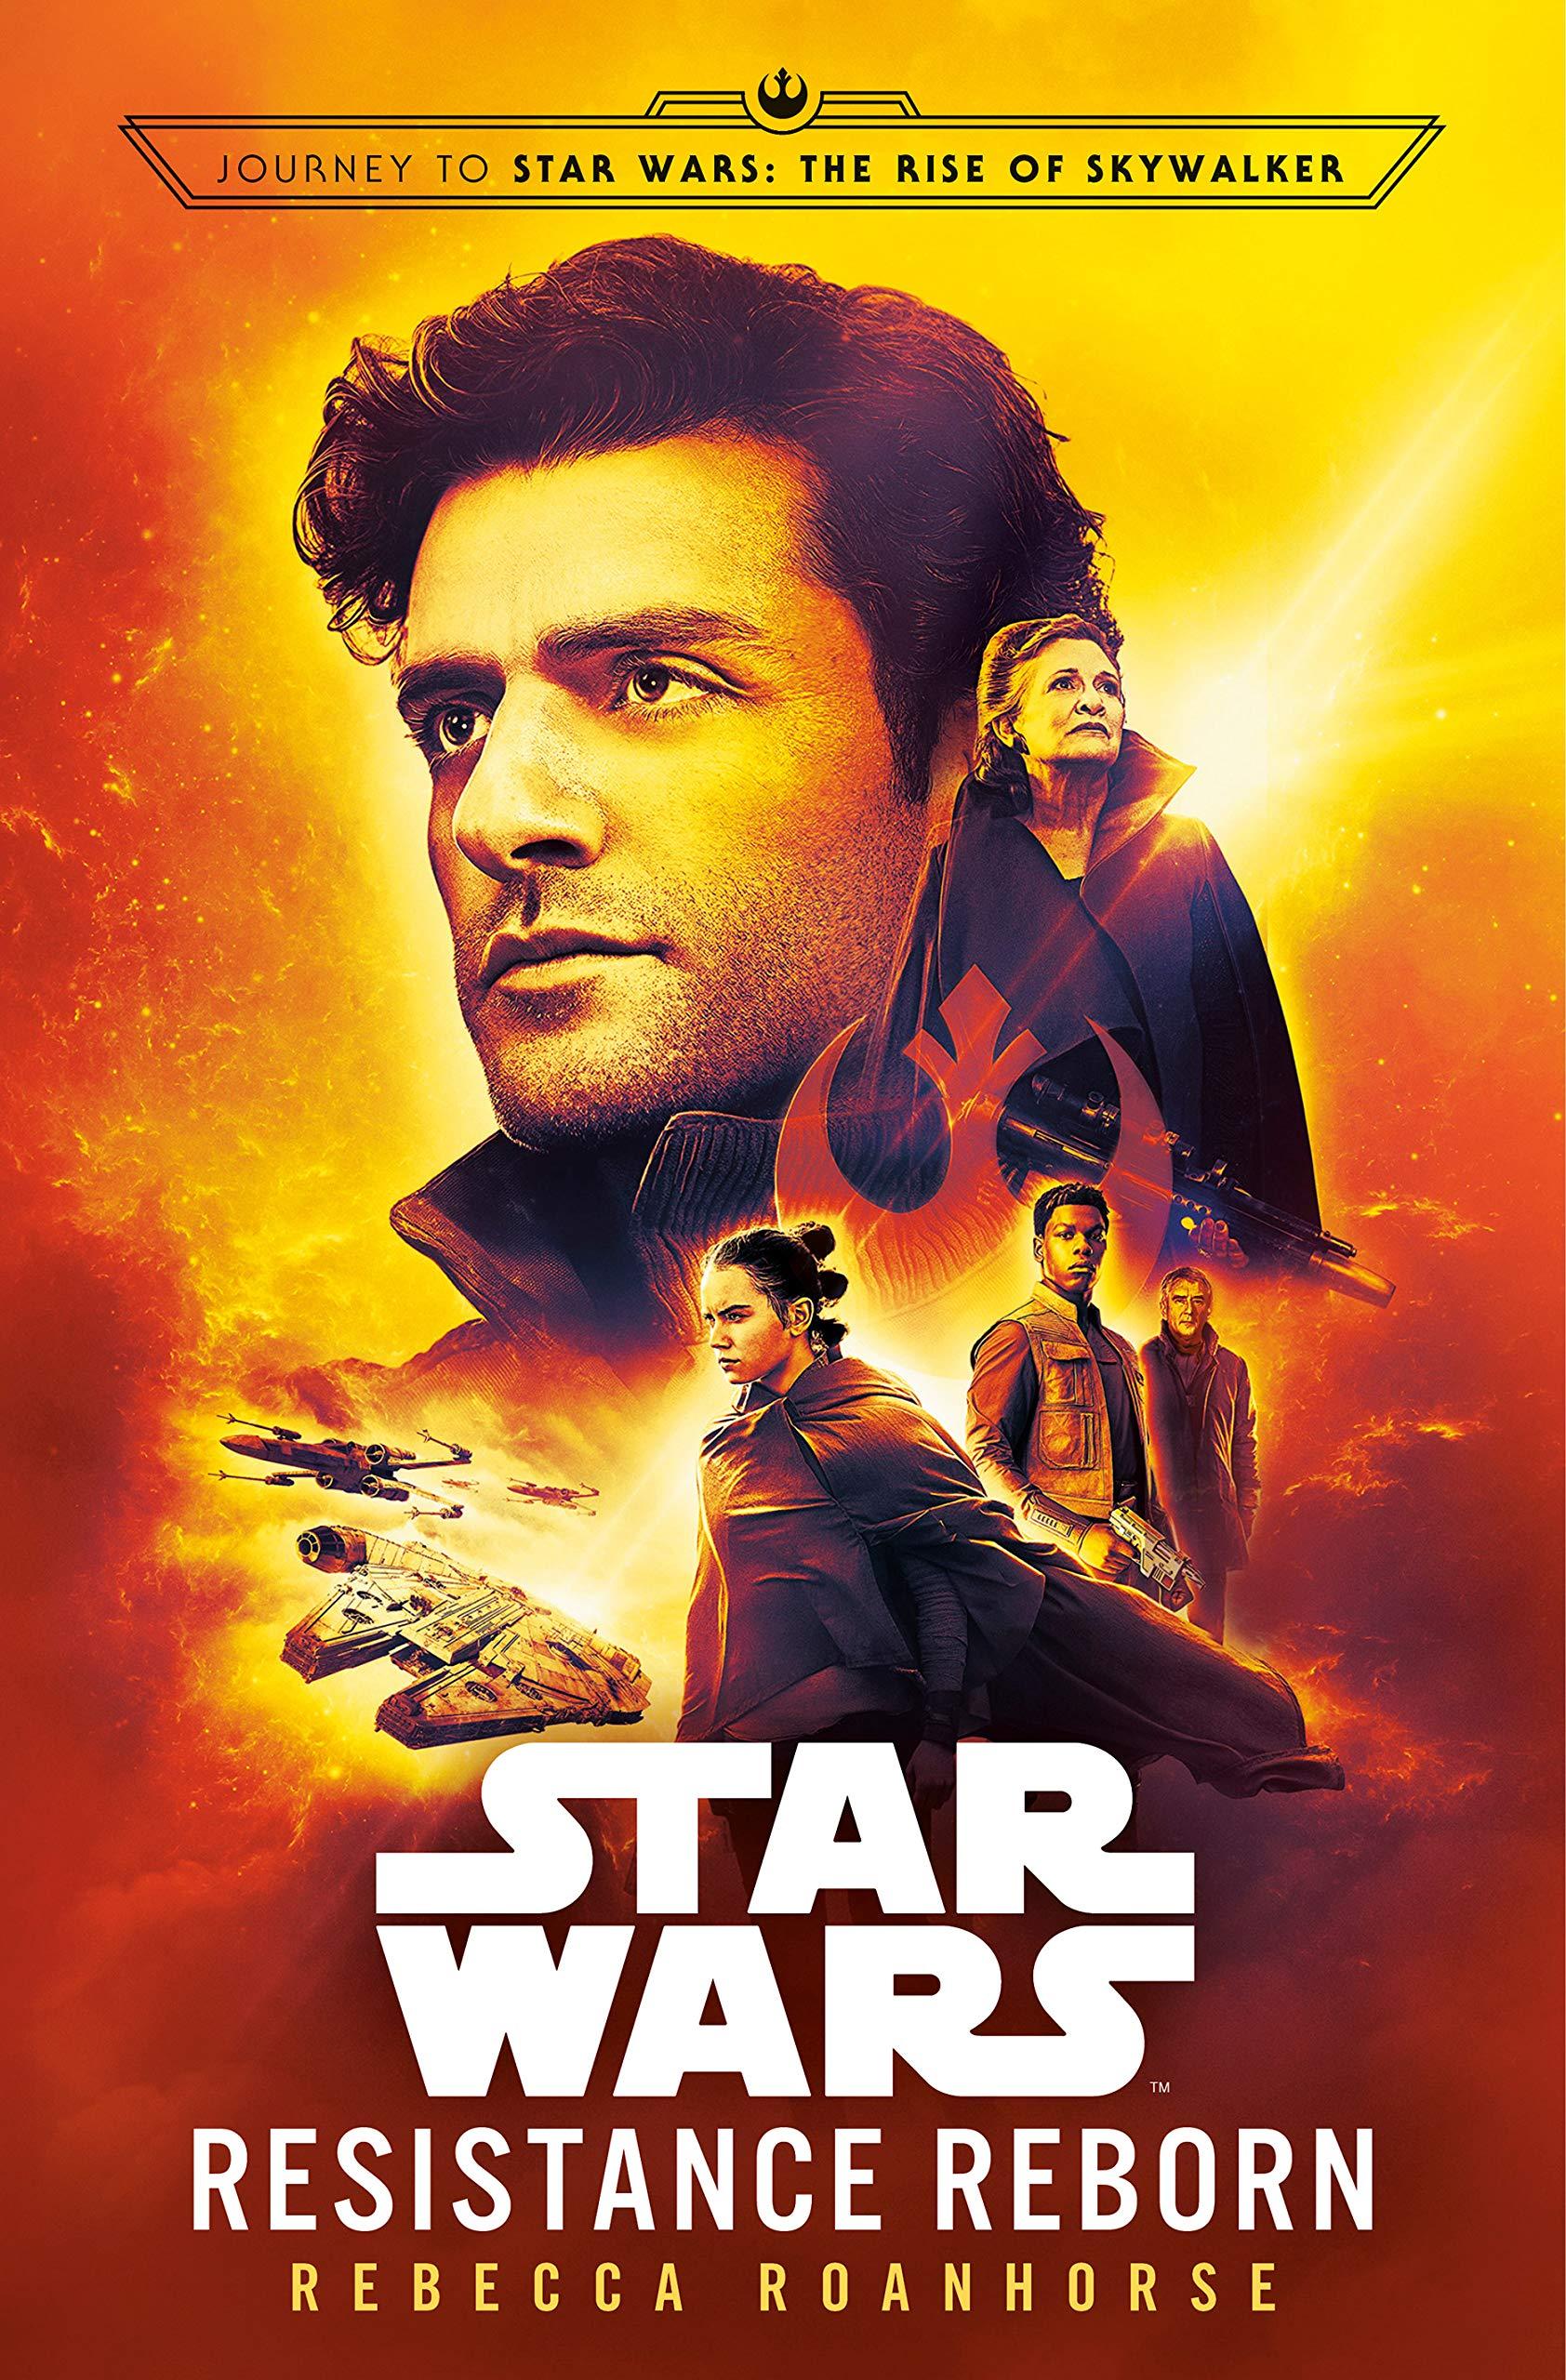 Amazon Com Resistance Reborn Star Wars Journey To Star Wars The Rise Of Skywalker 9780593128428 Roanhorse Rebecca Books